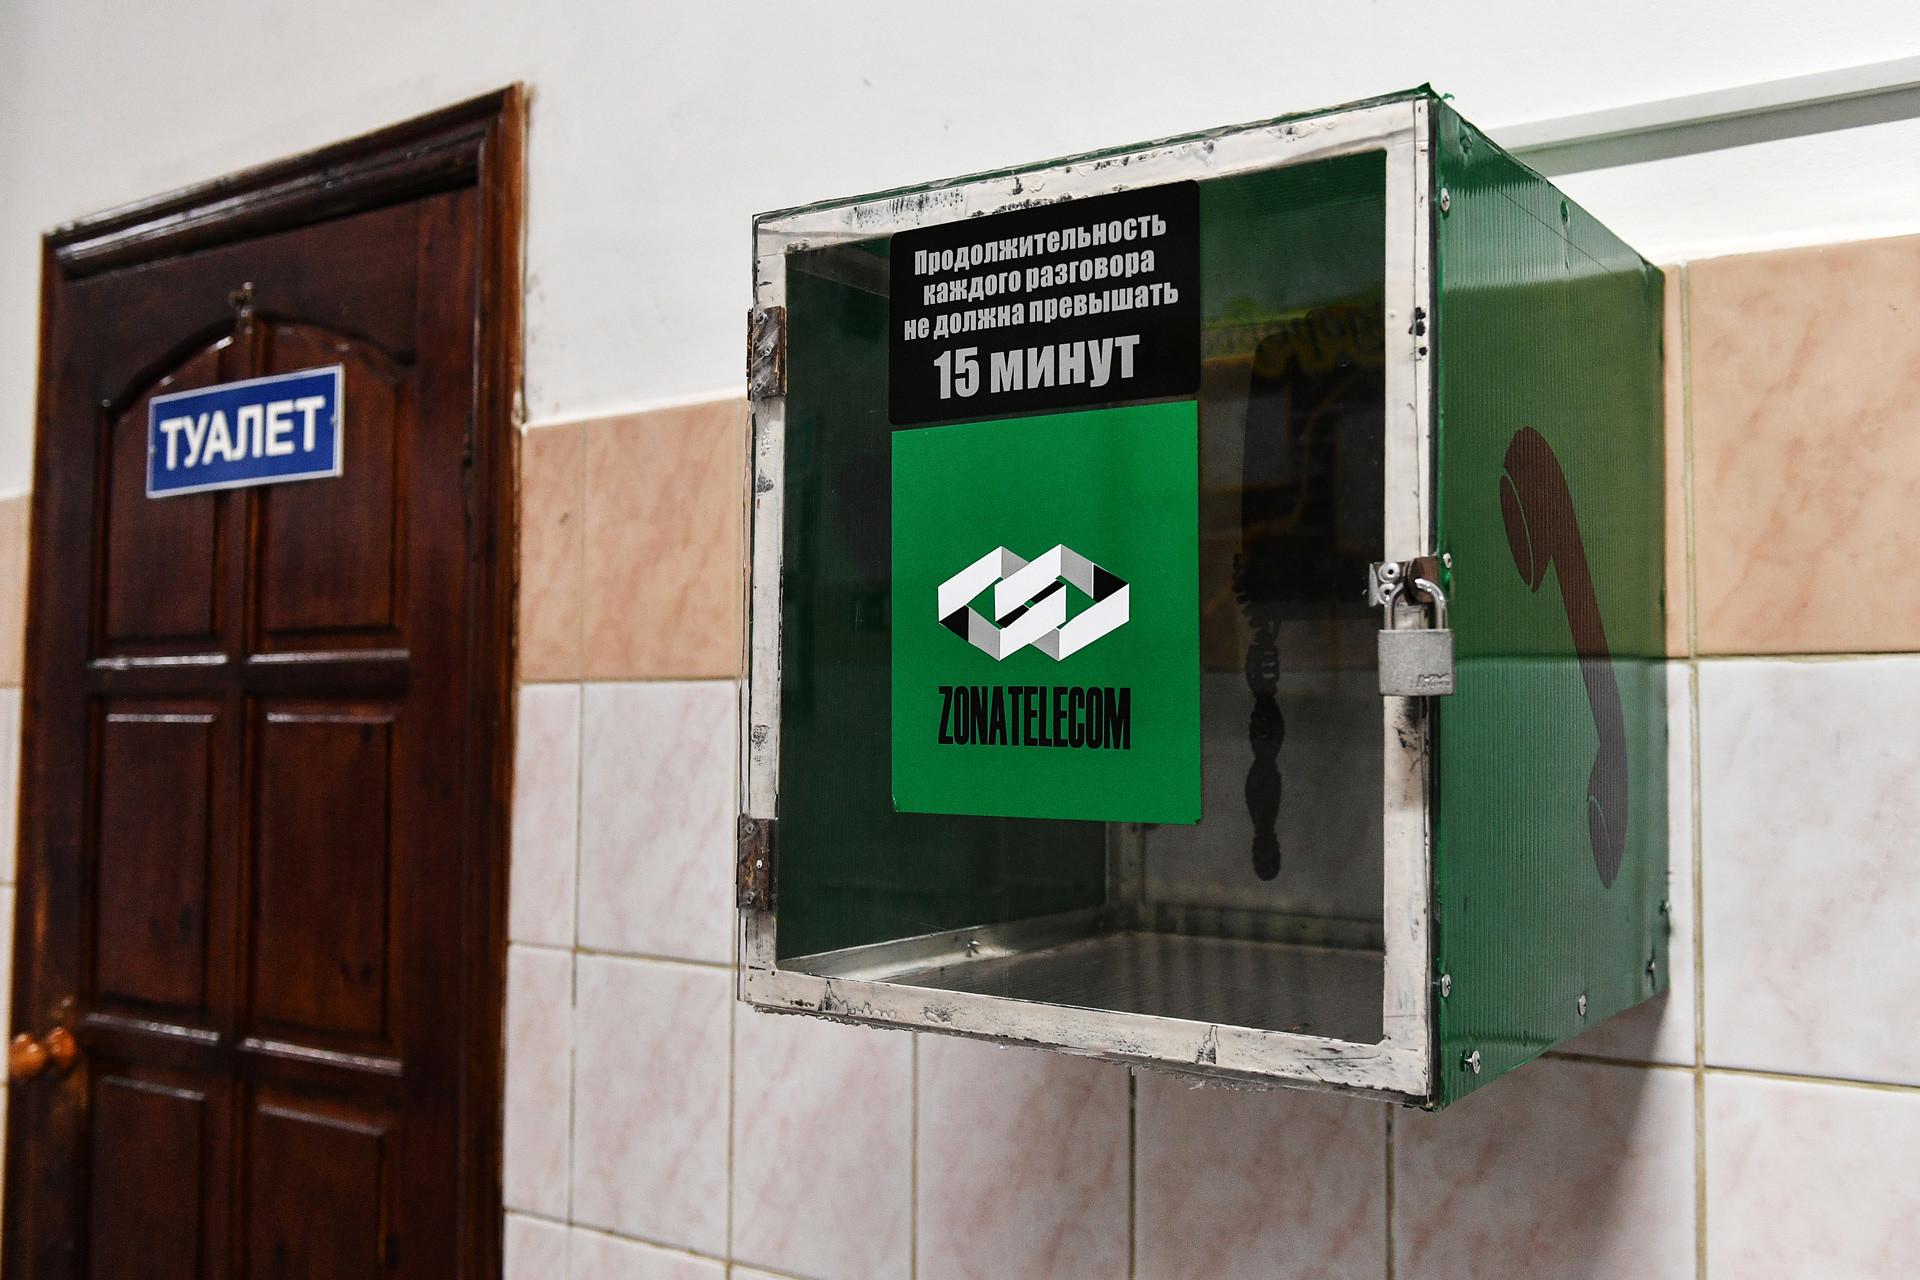 Футболистов Александра Кокорина и Павла Мамаева арестовали на два месяца за драки. Сейчас они находятся на